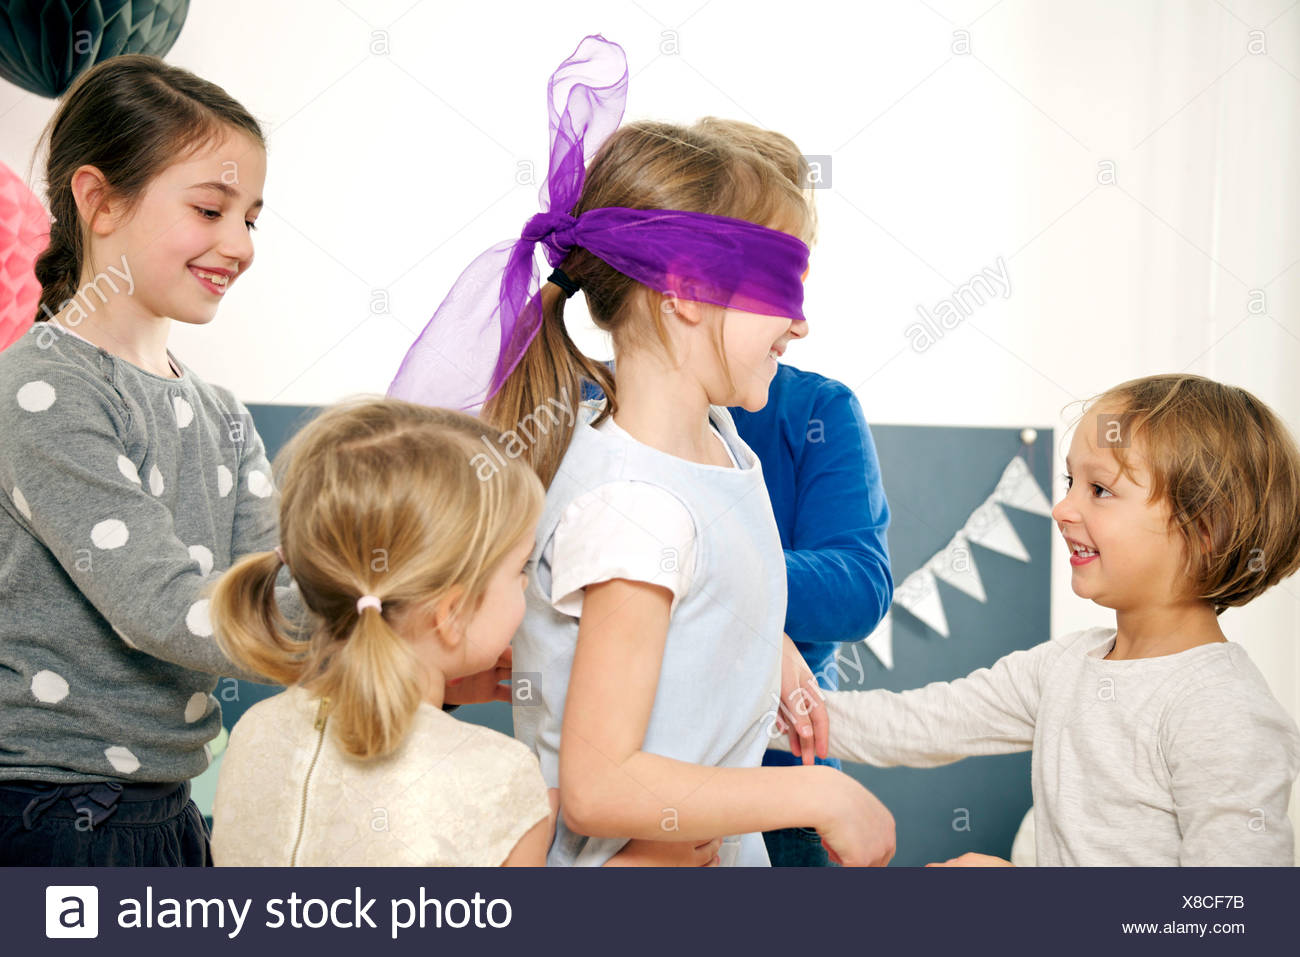 Children on birthday party playing Blind Man's Bluff, Munich, Bavaria, Germany - Stock Image